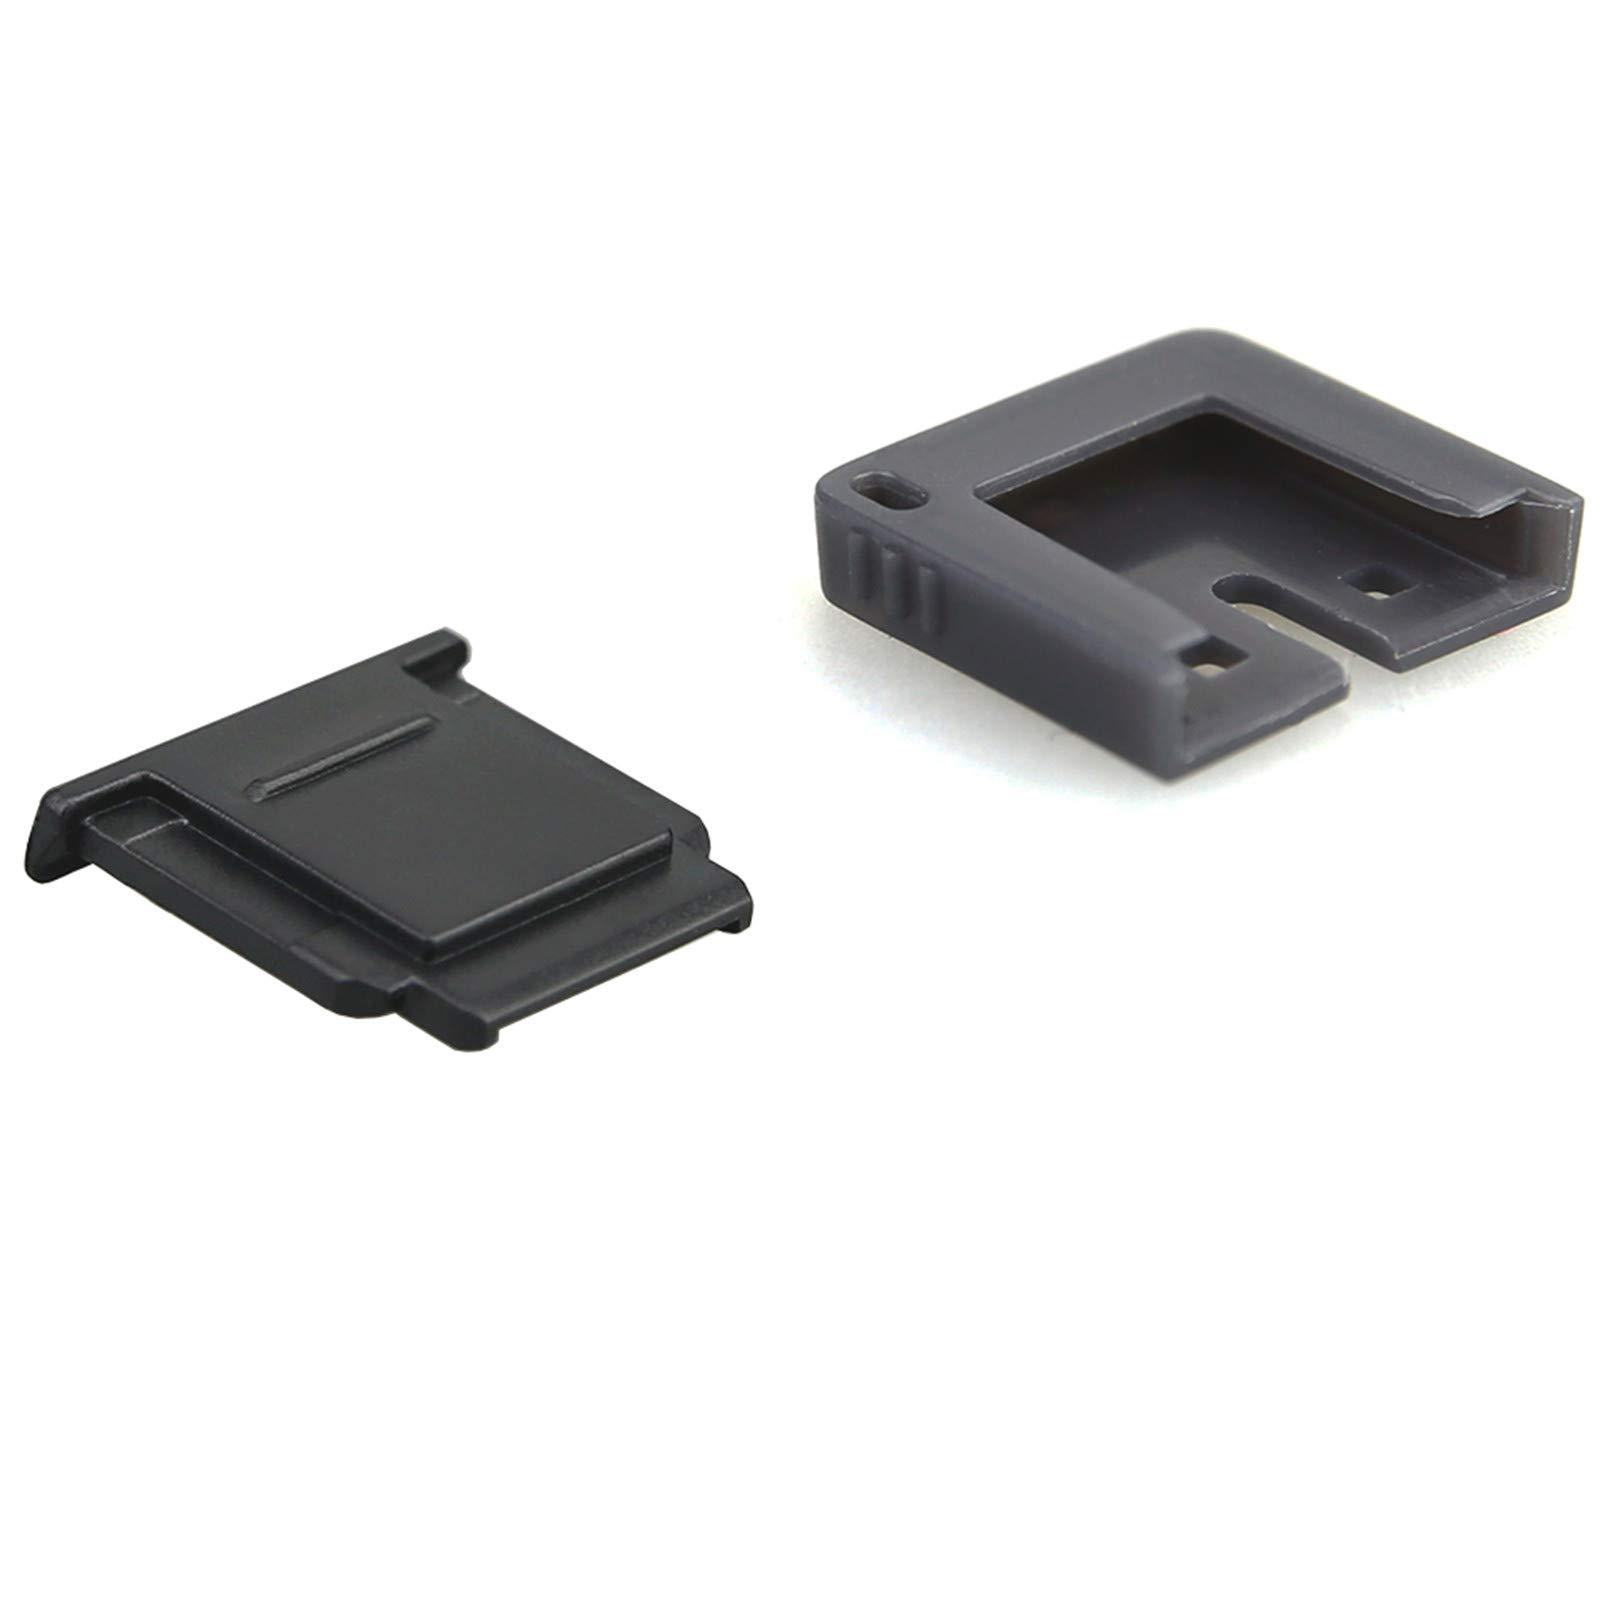 MI Multi Interface Hot Shoe Cover Protector Cap for Sony A1 A9II A7SIII A7RIV A7RIII A7III A6600 A6500 A6400 A6300 A6100 A6000 Camera & Flash HVL-F32M HVL-F45RM Microphone ECM-XYST1M ECM-GZ1M ECM-B1M